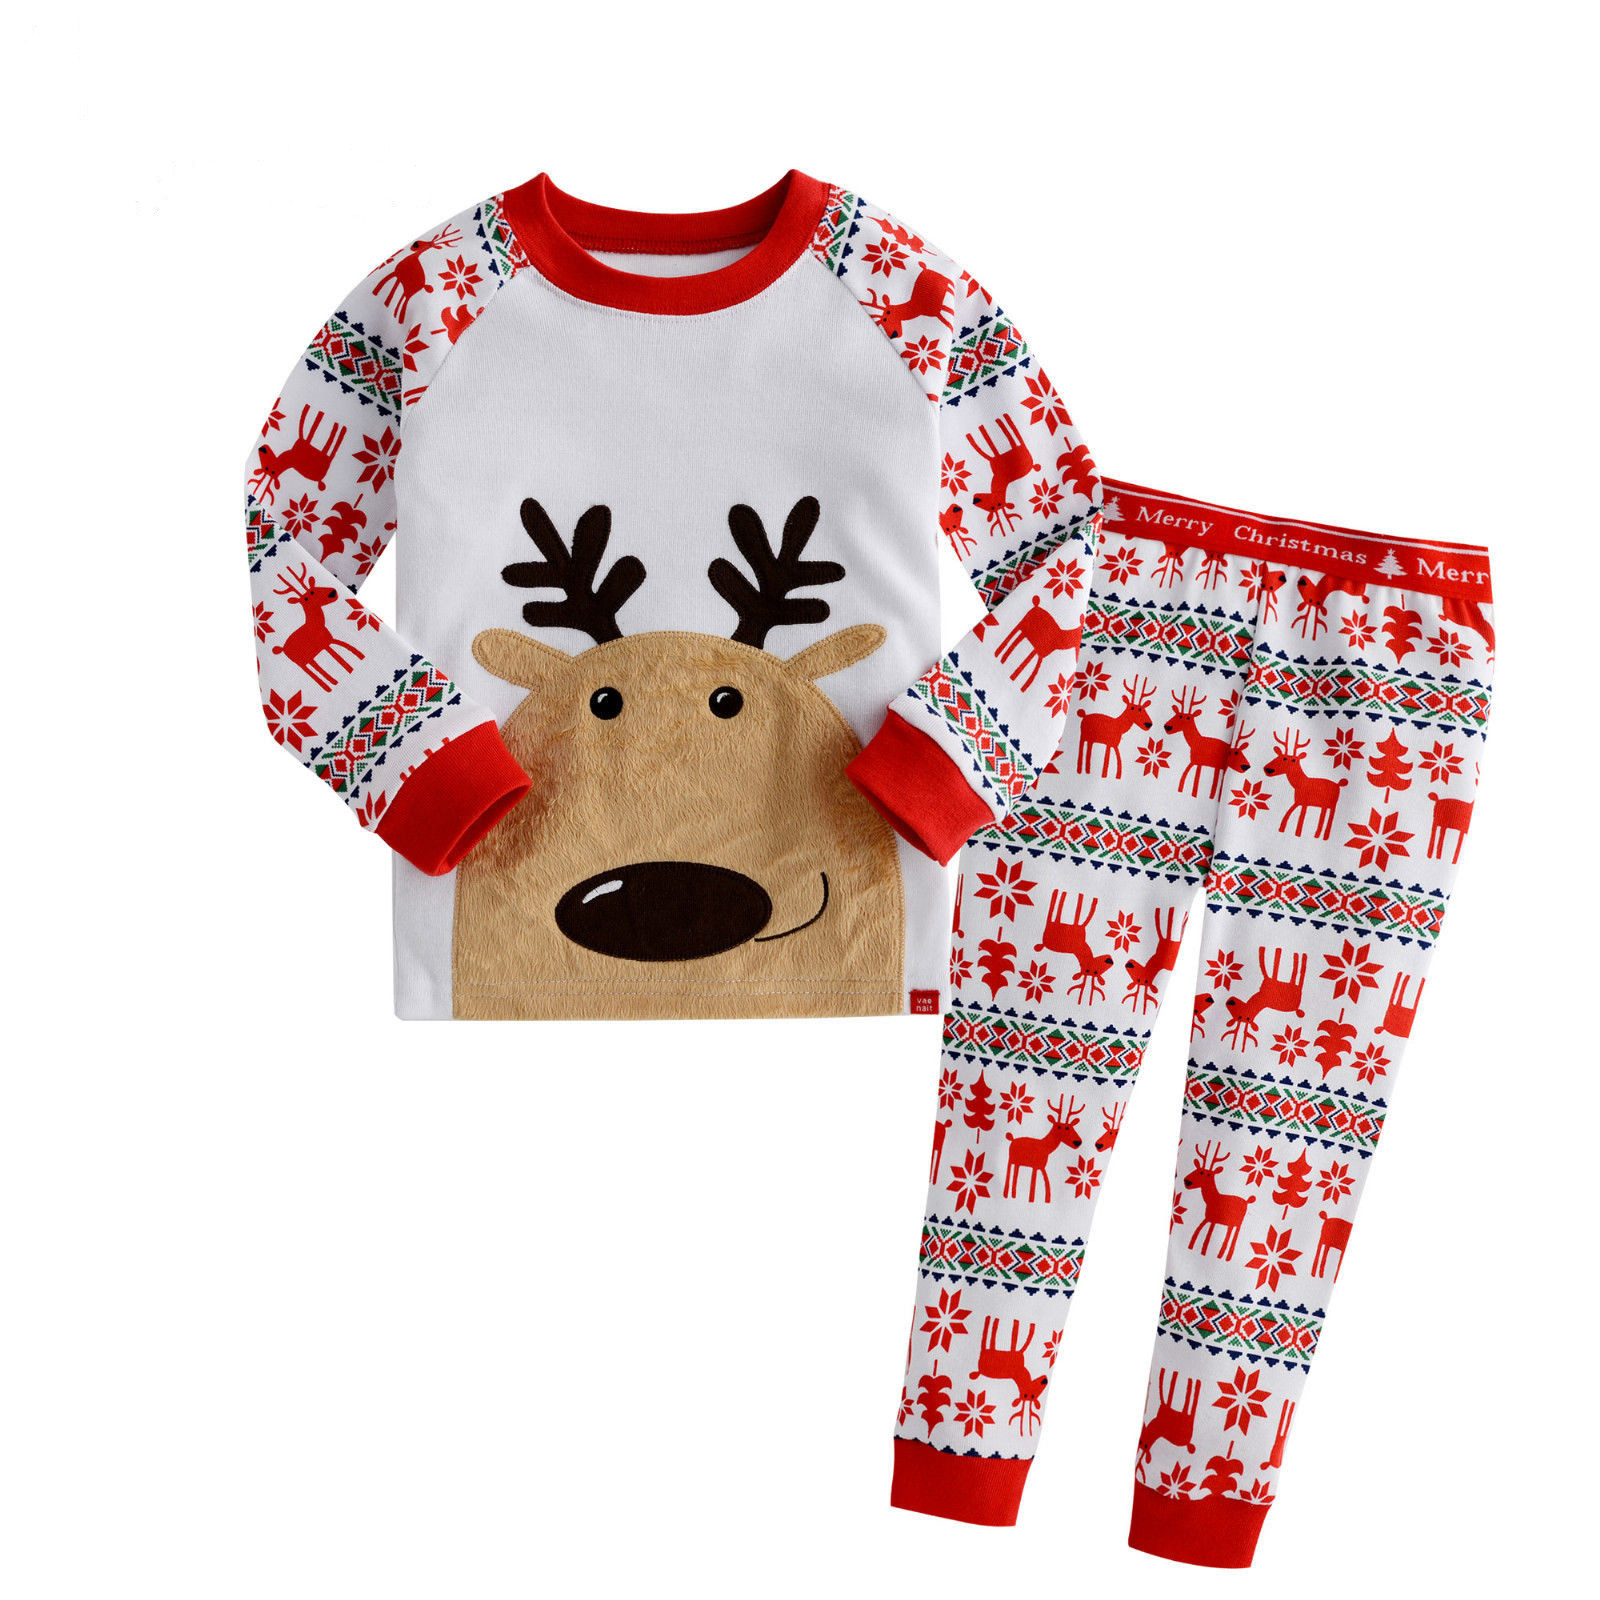 bf1fcad70 New Boys Girls Xmas Snowflake Reindeer Nightwear Sleepwear Pyjamas ...